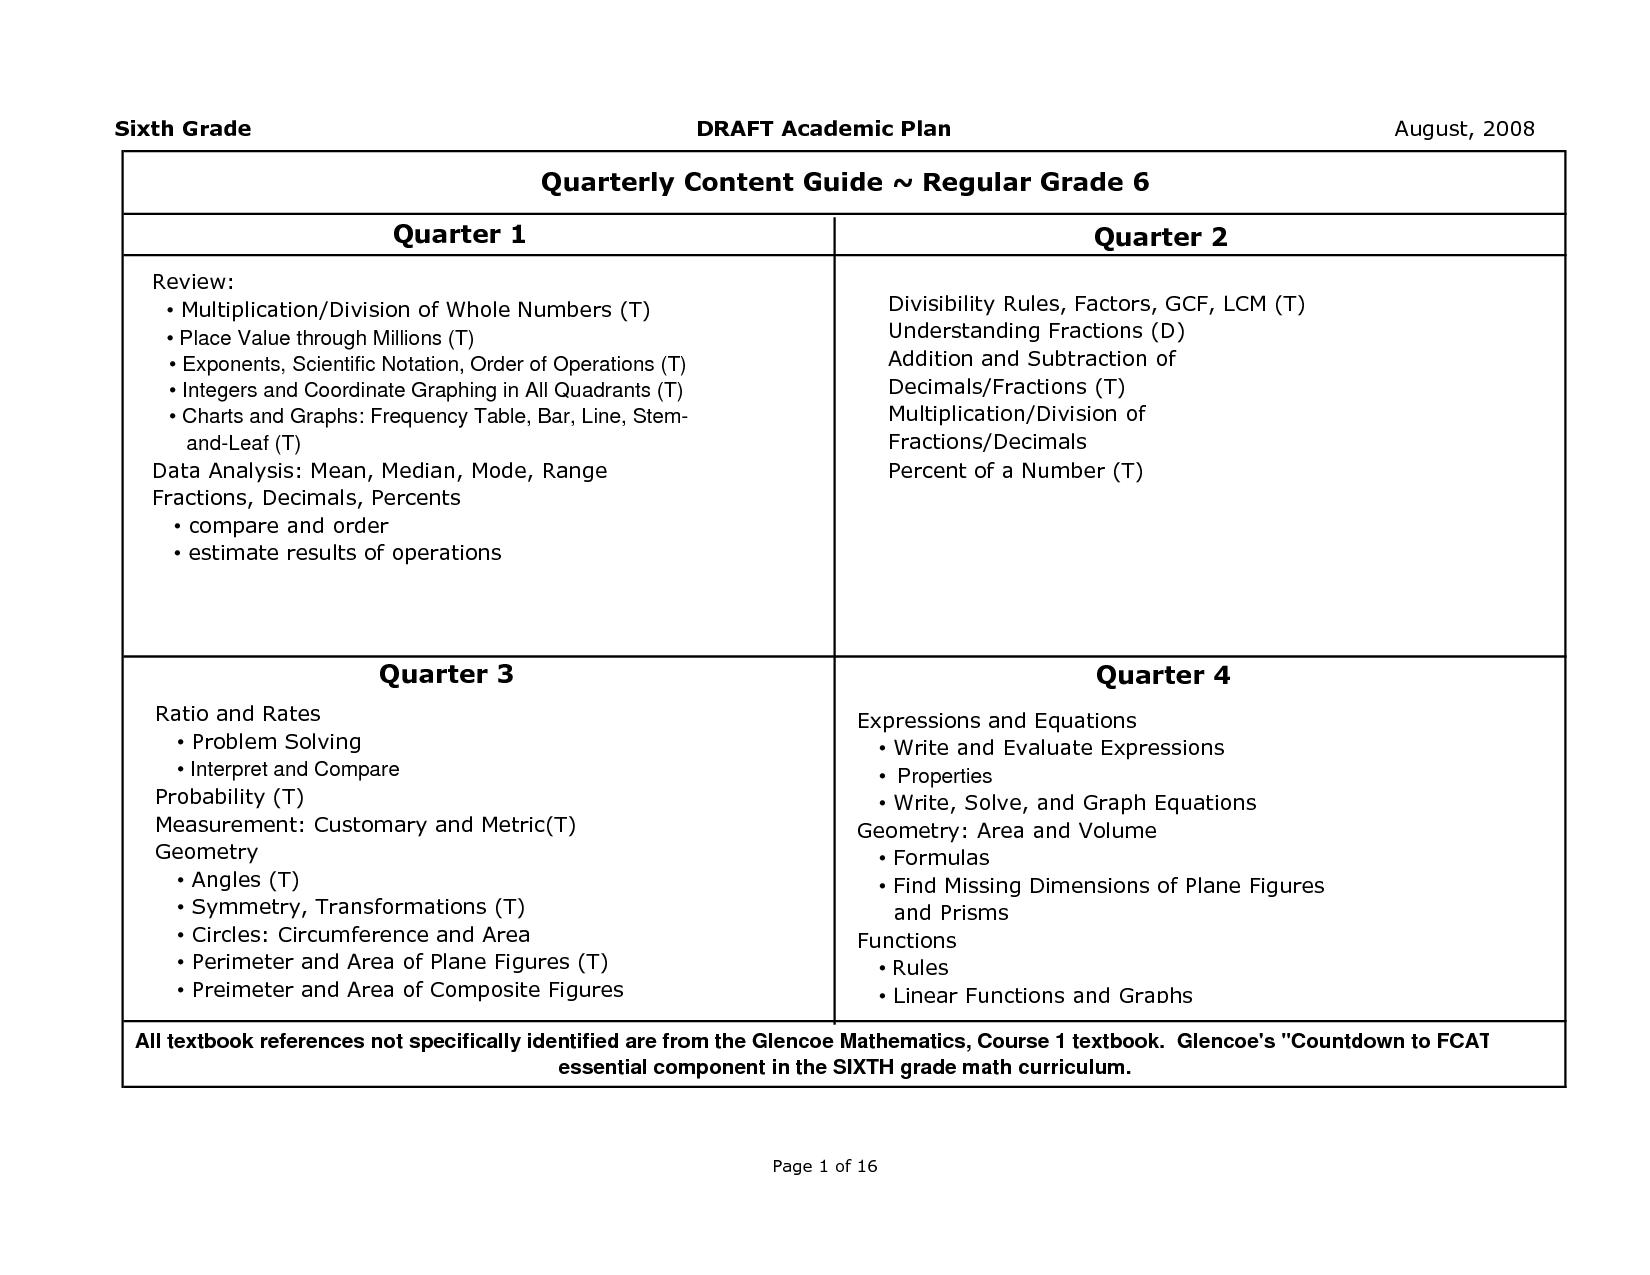 6 Grade Math Worksheets free image